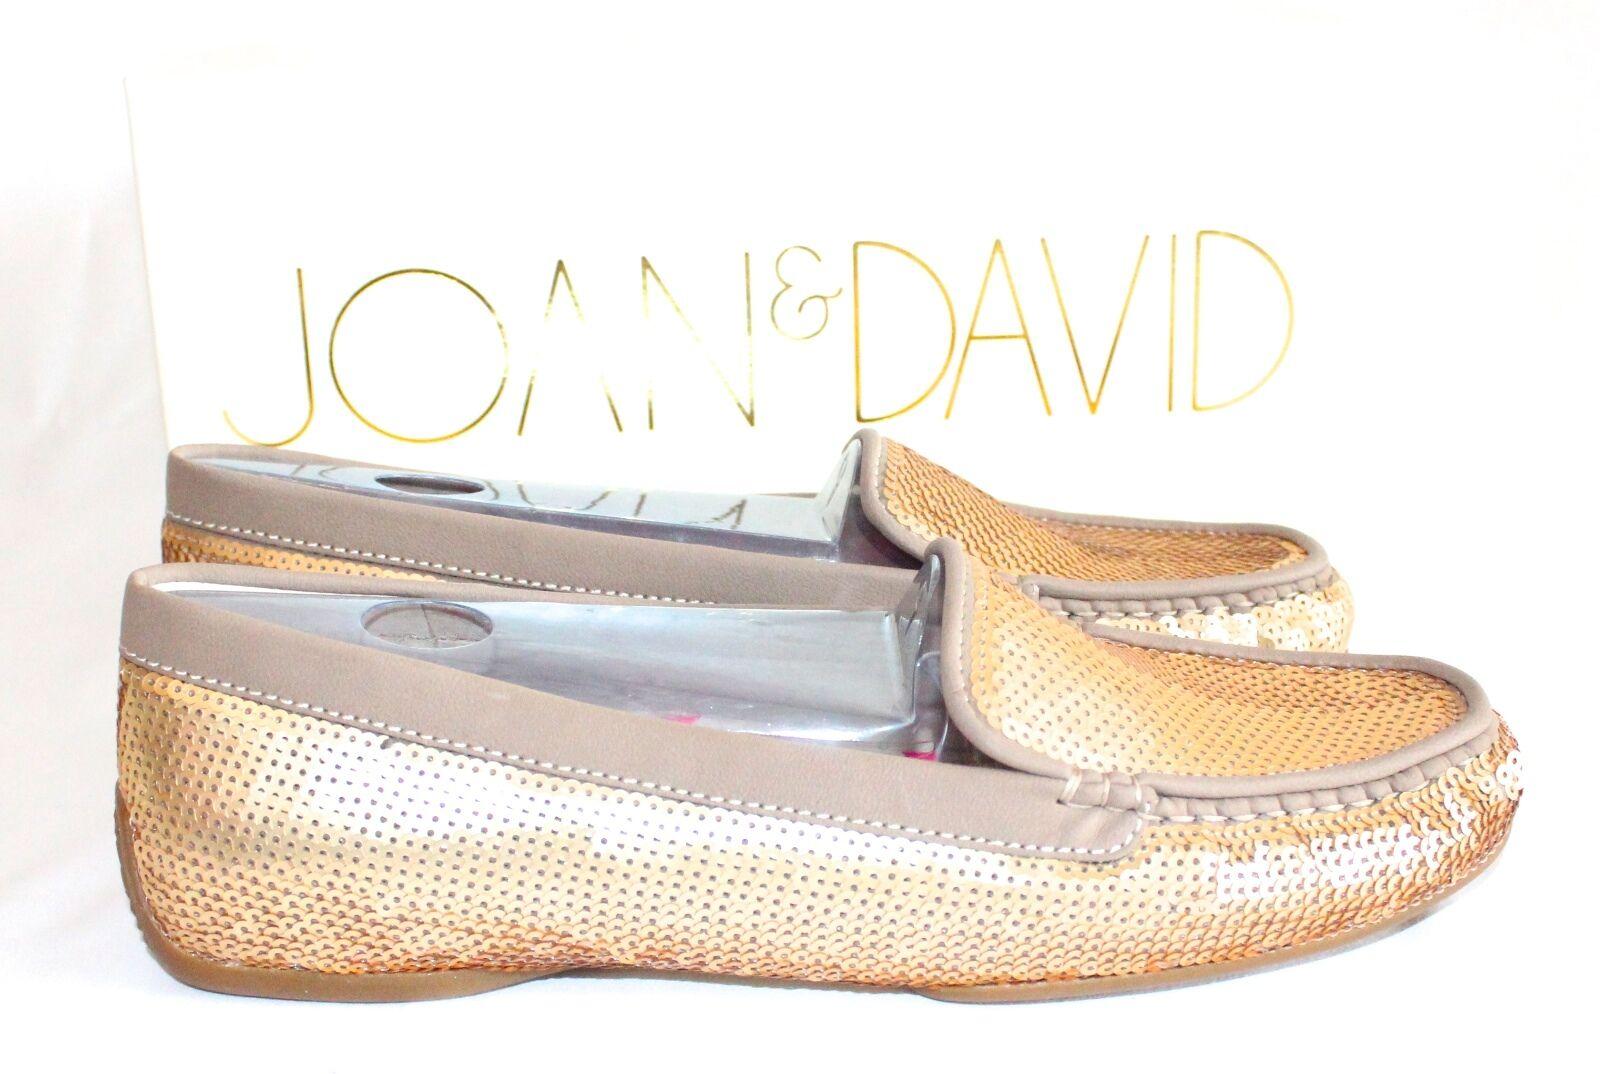 Scarpe for Donna Ballet Flats Joan&David Joan&David Joan&David Taglia 9 81d6ac